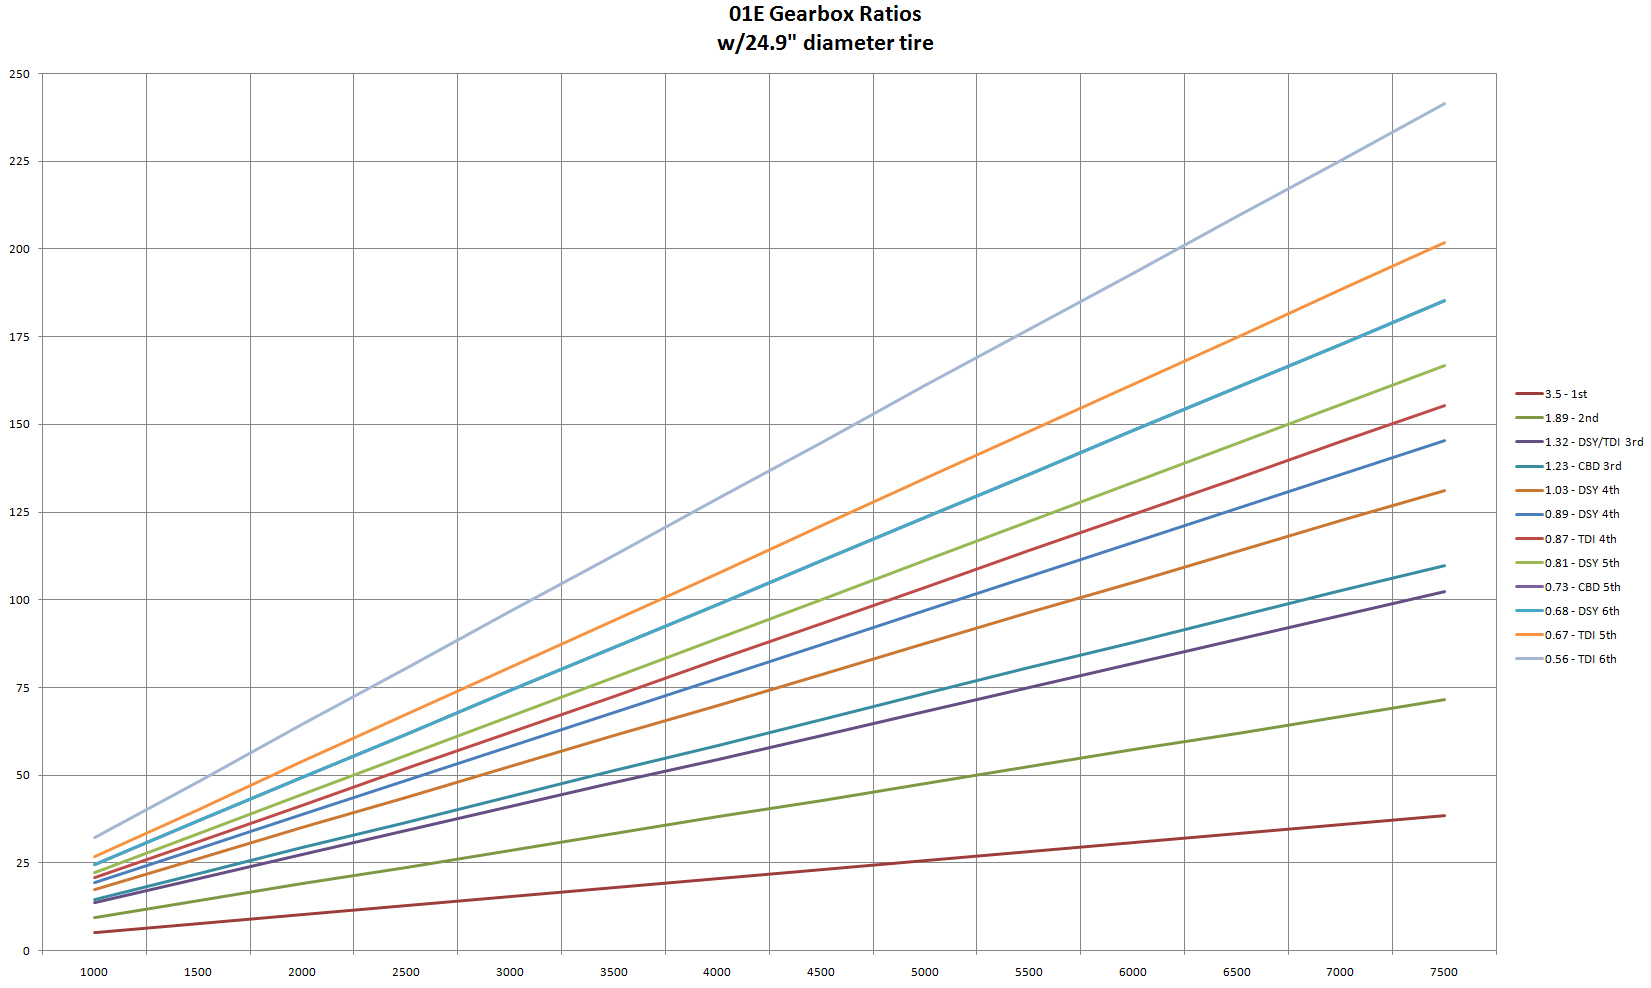 01E CBD, DSY and TDI gearbox ratio and     - VWVortex com